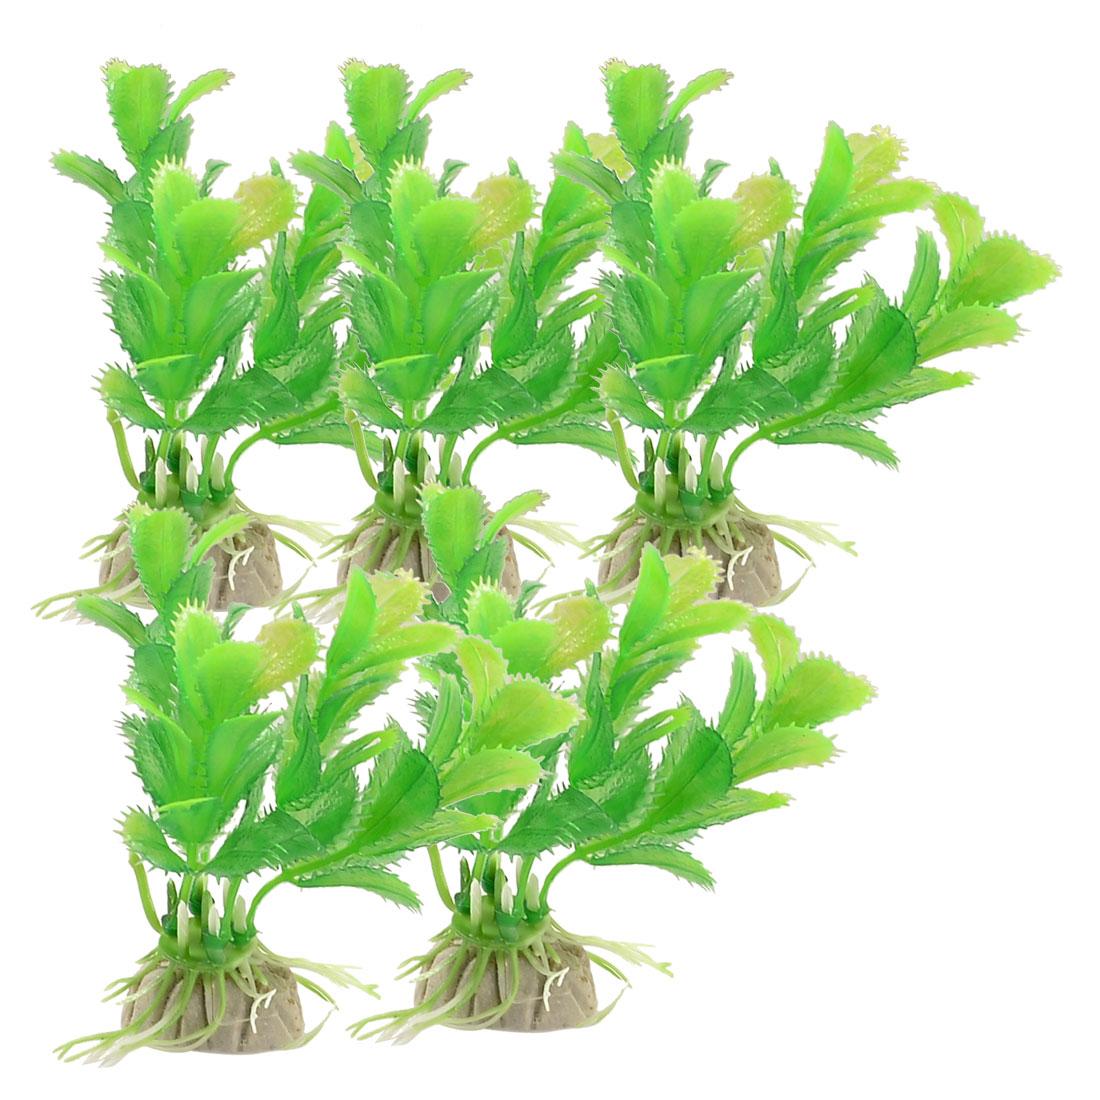 "5 Pcs Green Emulational Plastic Grass Plant 3.1"" Heiht for Aquarium"